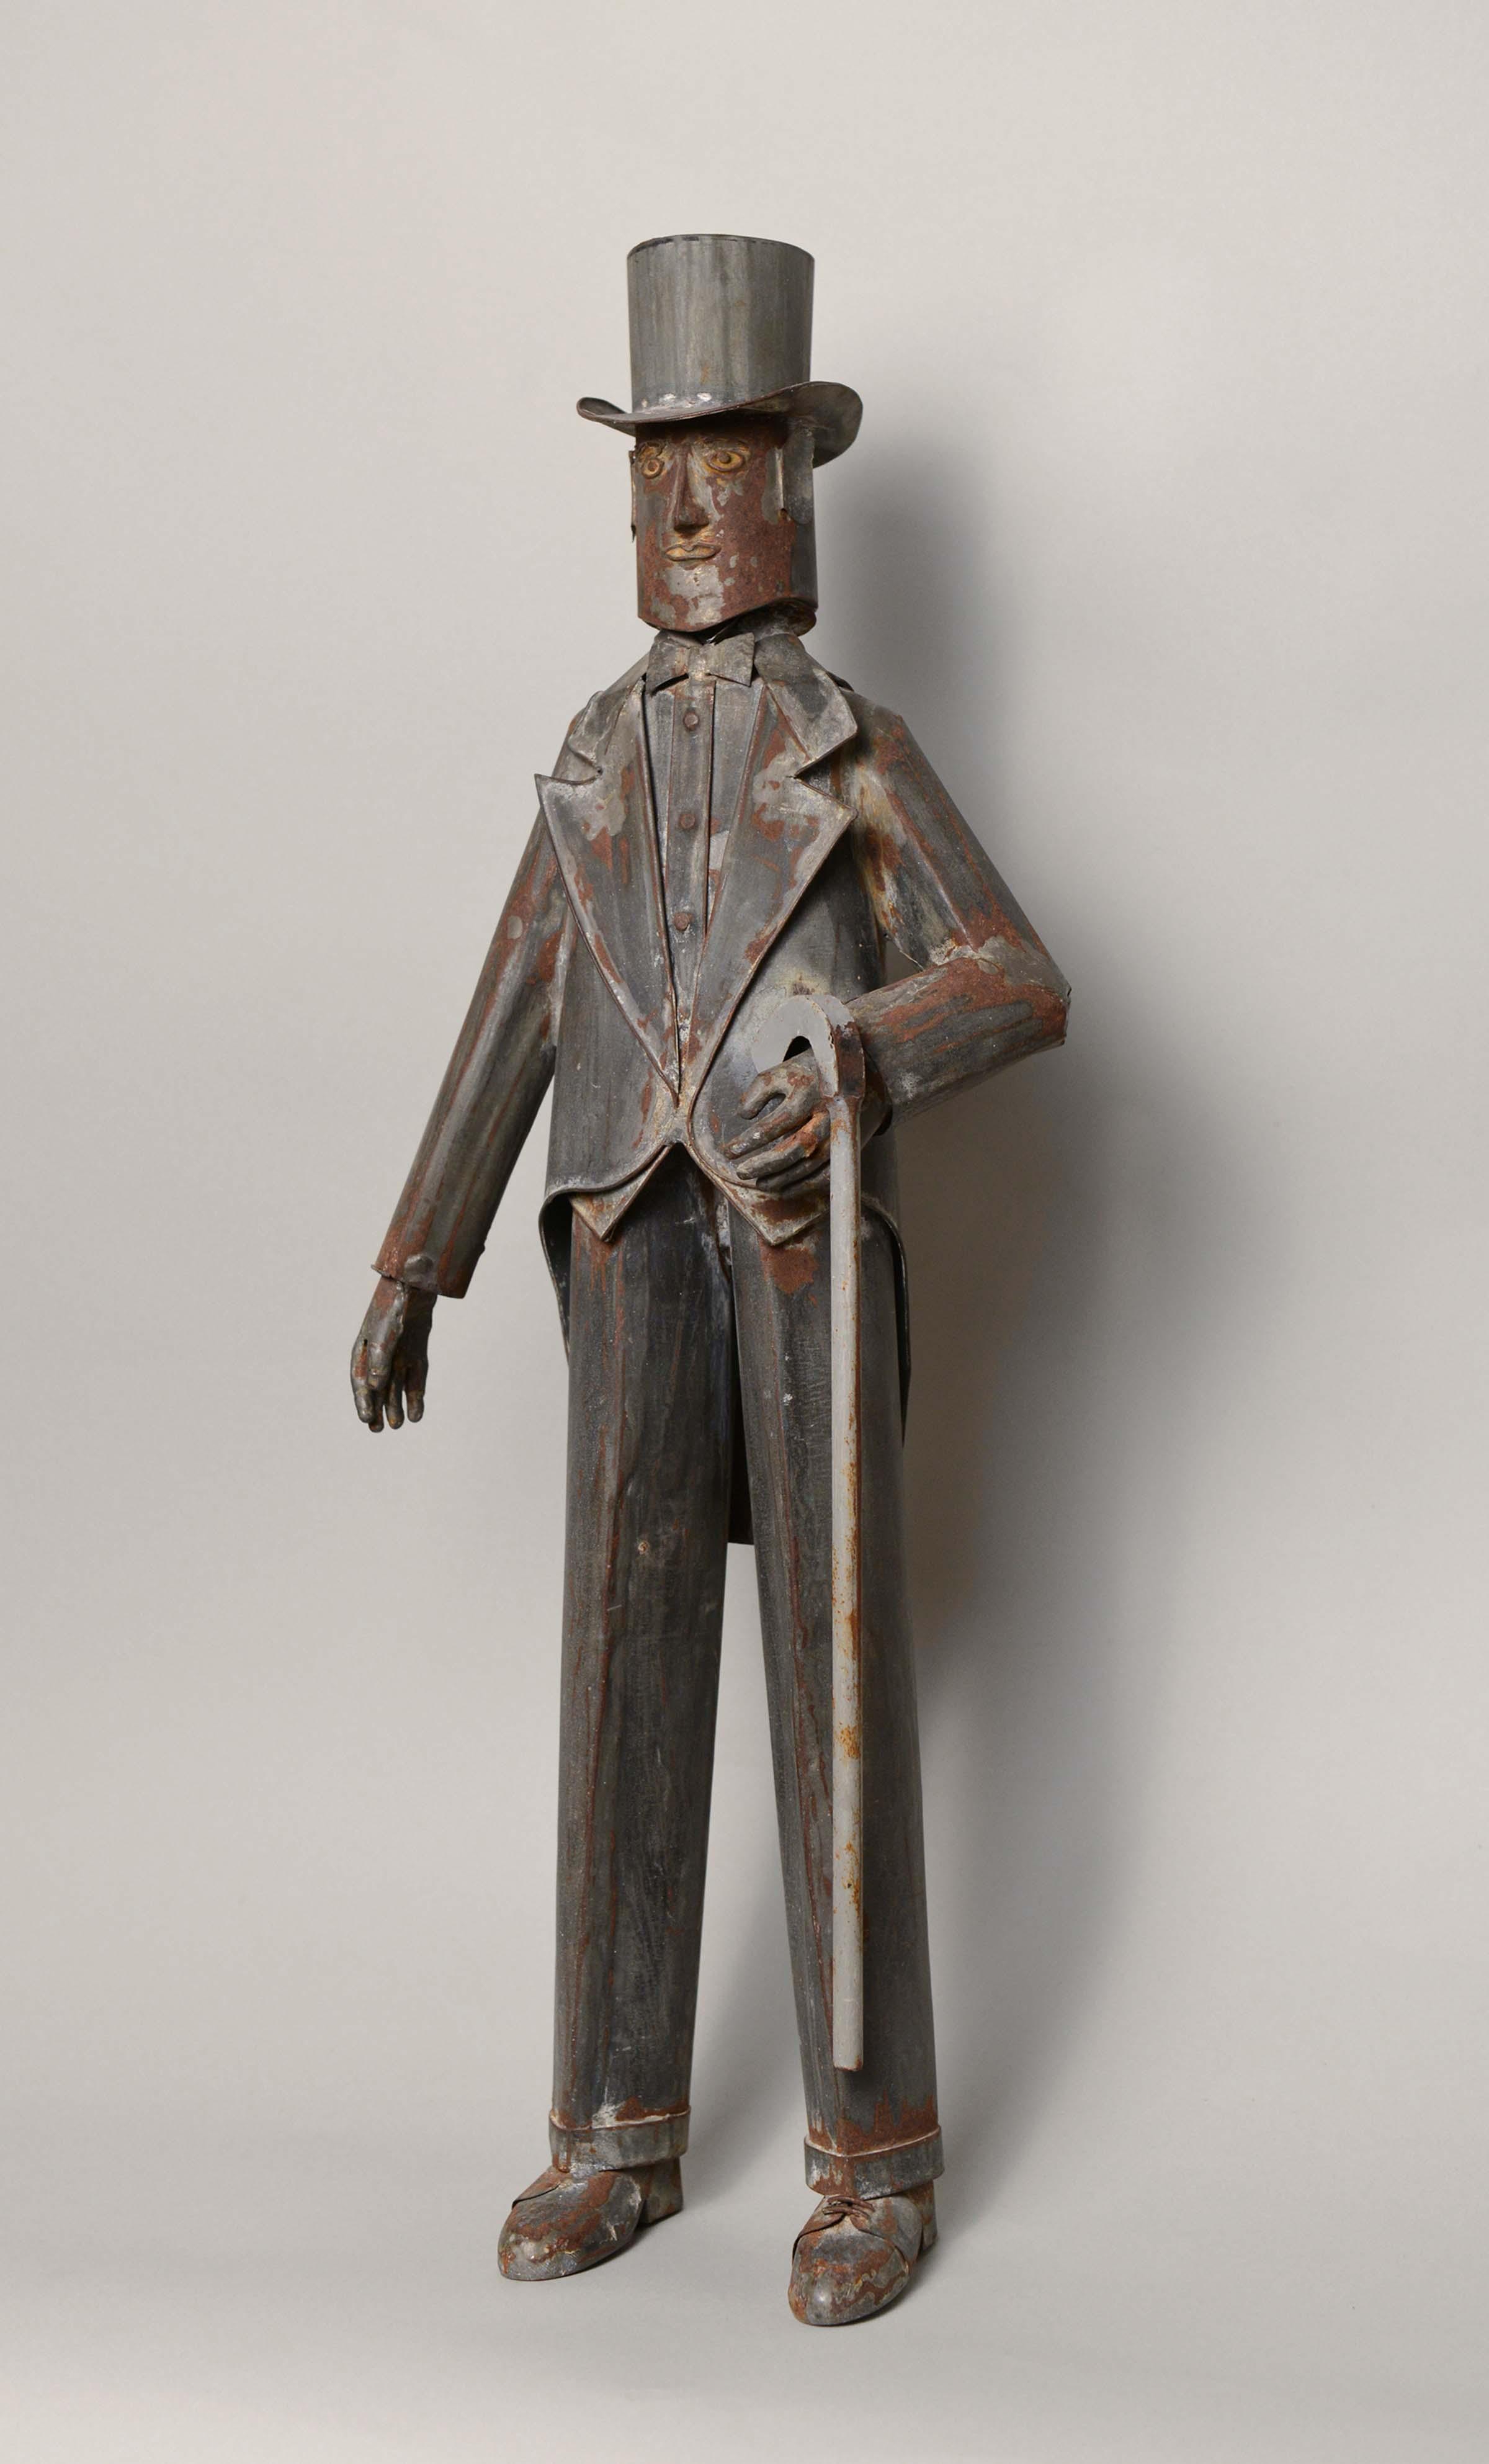 Anonymous, Brooklyn, NY, Tin Man, c. 1935, tin, 27h in.